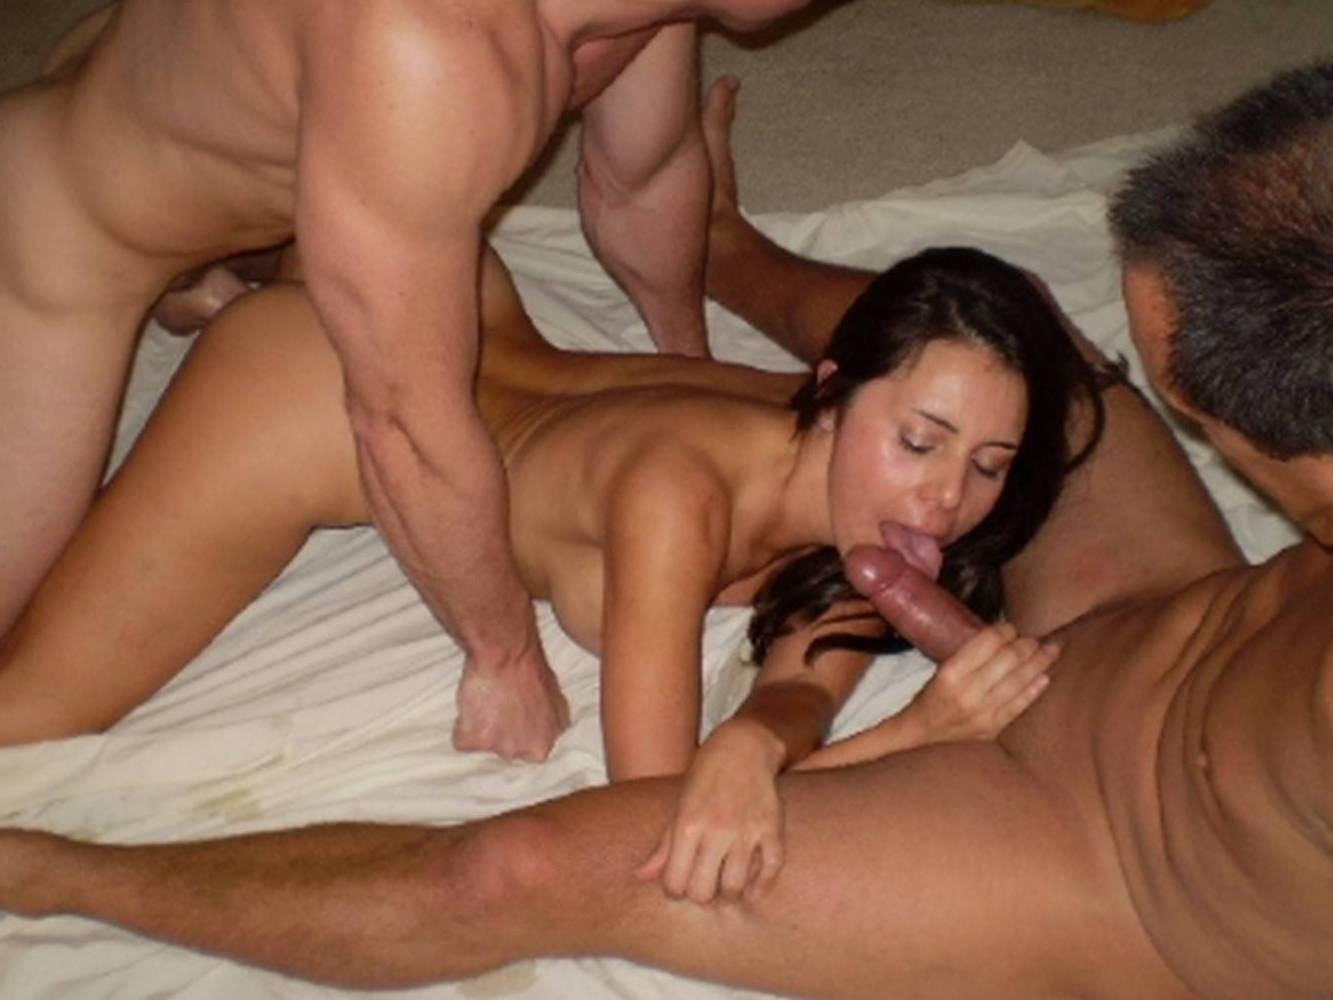 Teen Amateur Threesome Webcam